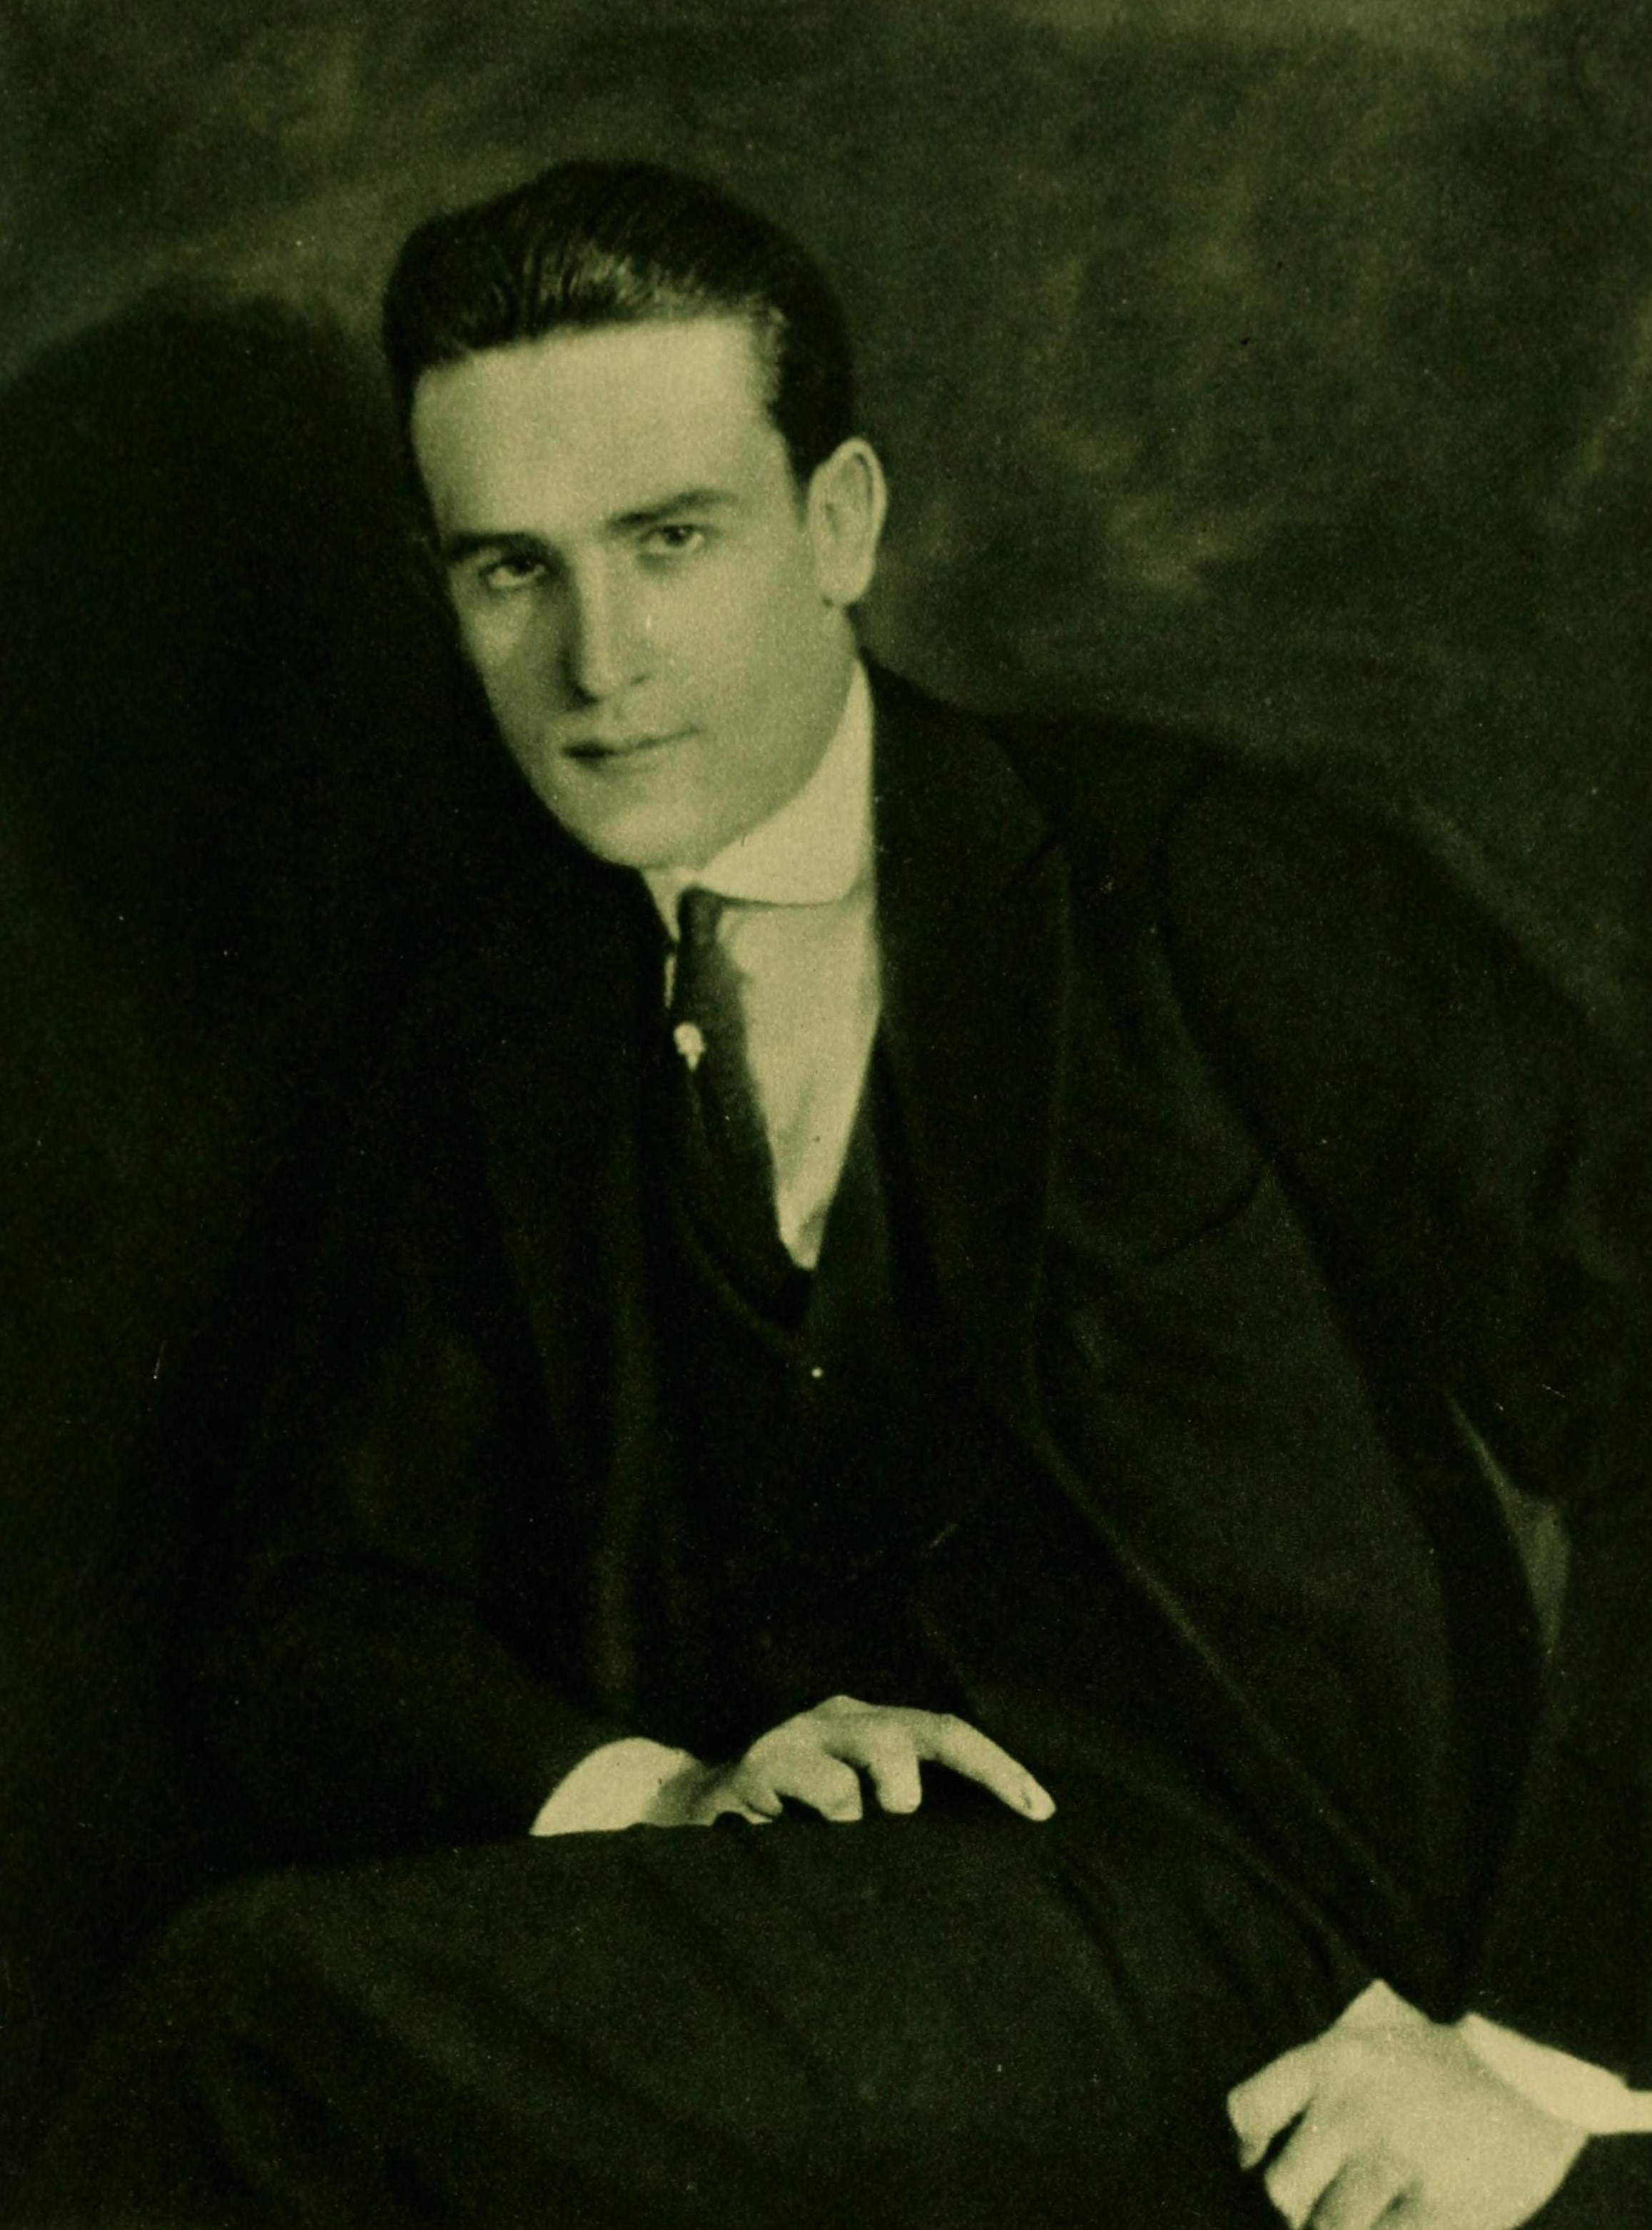 Photo Harold Lloyd via Opendata BNF